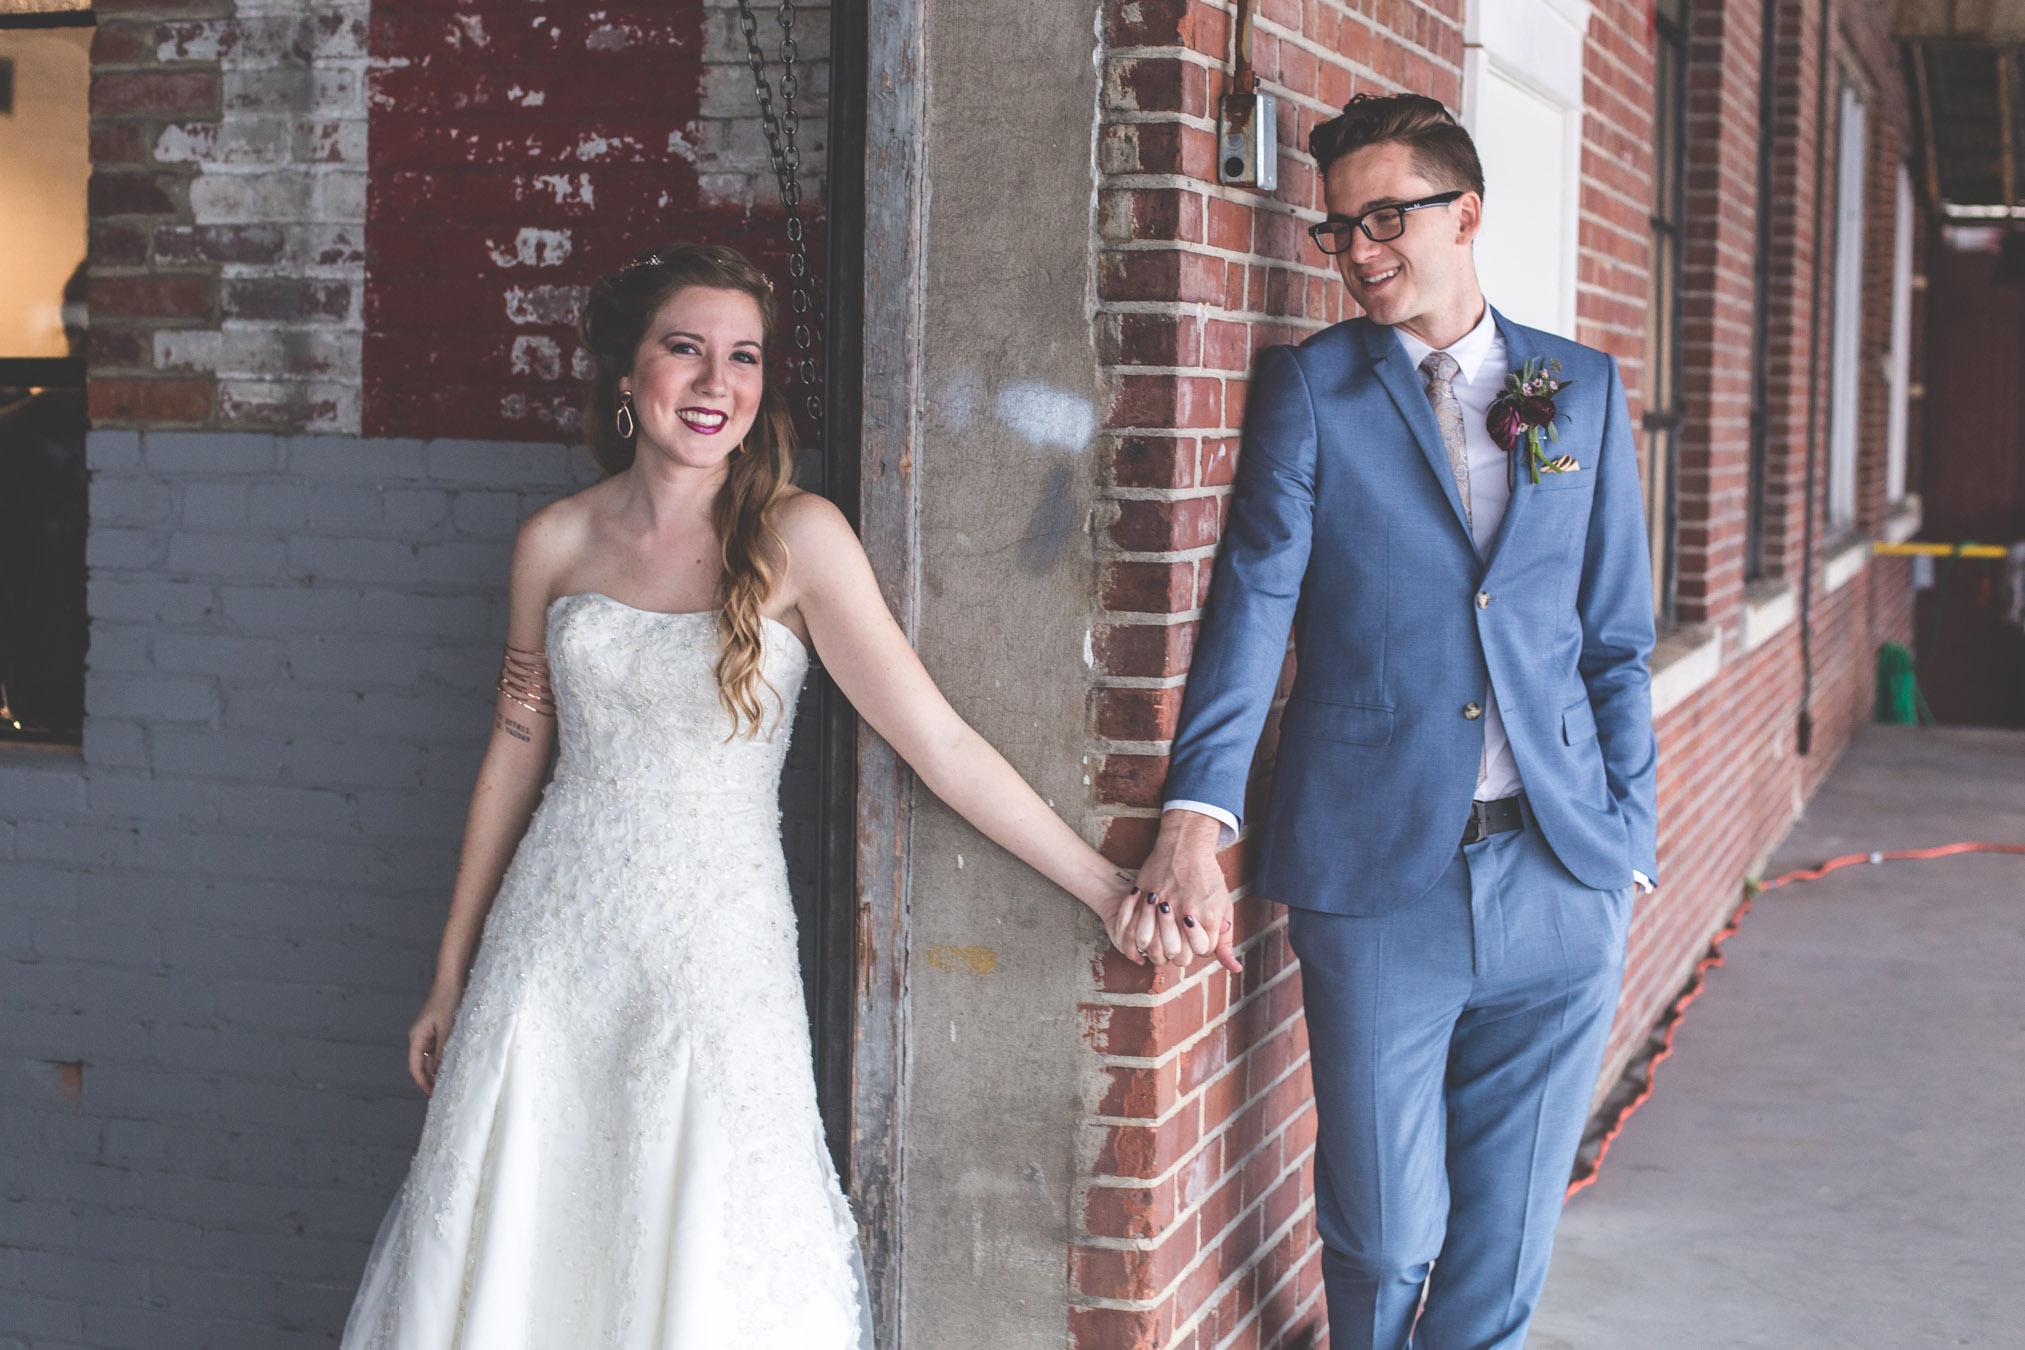 Adam-Szrmack-The-Glass-Factory-Wedding-89.jpg